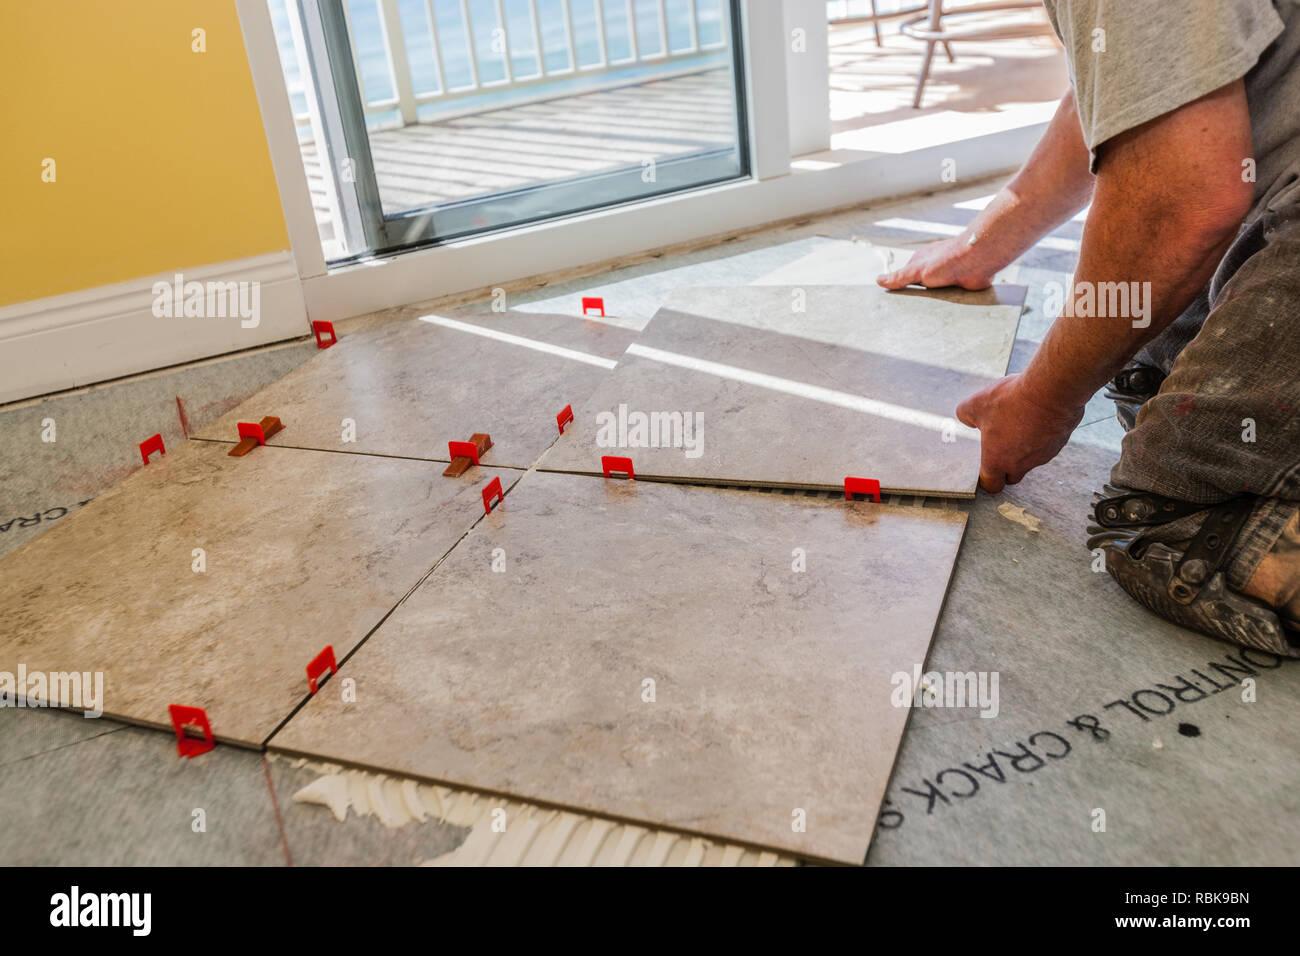 Man Laying Square Tile On Adhesive - Stock Image